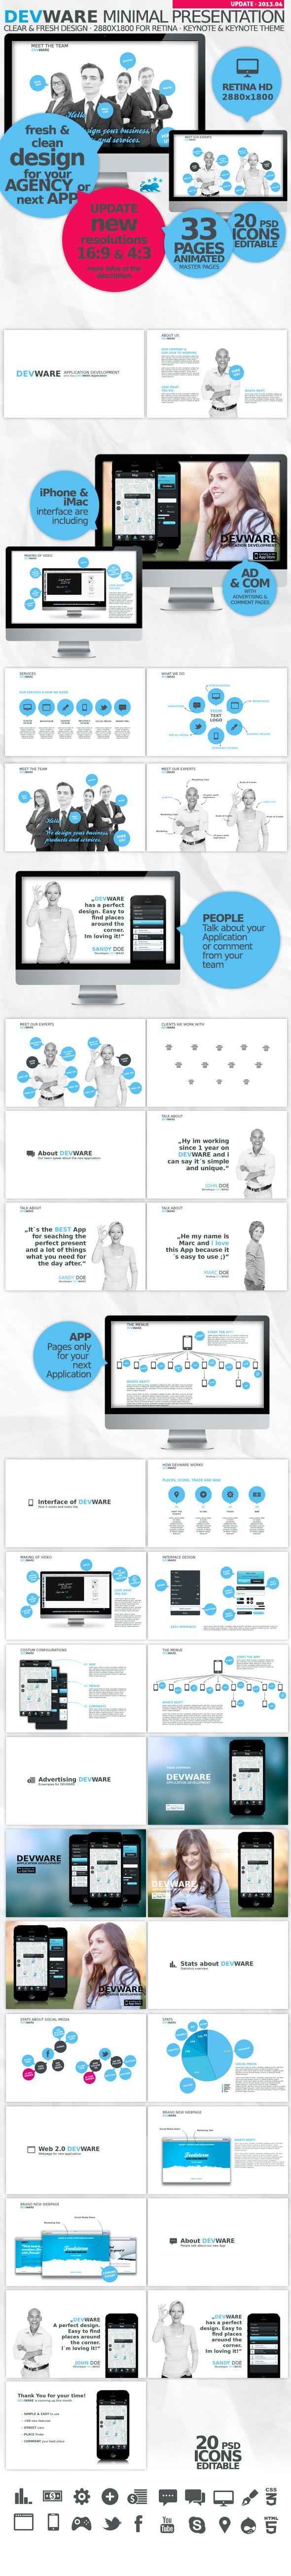 Devware 33 Pages Keynote Presentation - Business Keynote Templates